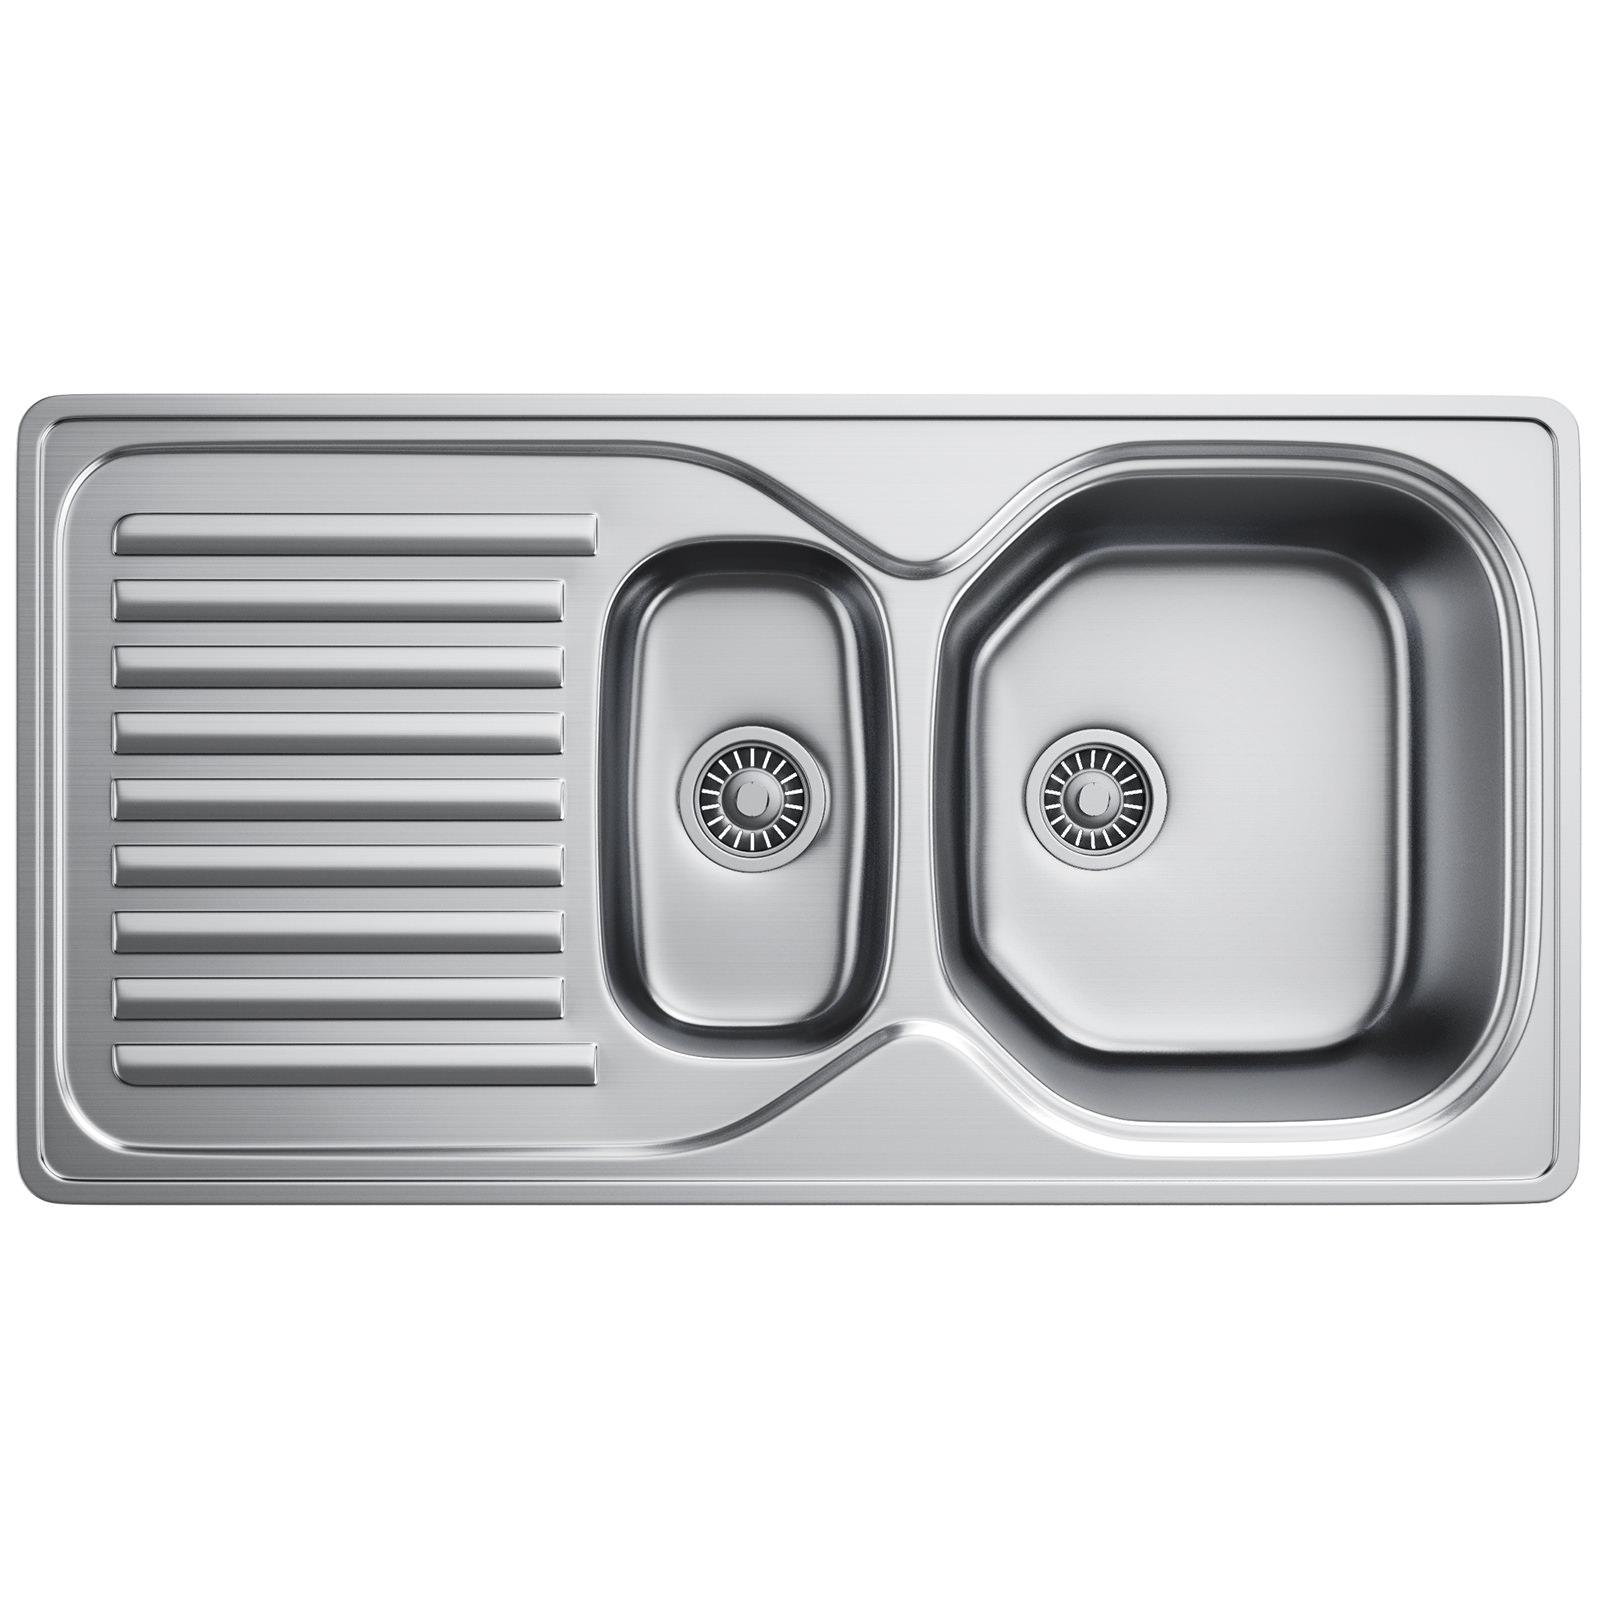 Franke Inset Kitchen Sink : Franke Elba ELN 651 Stainless Steel 1.5 Bowl Inset Kitchen Sink ...